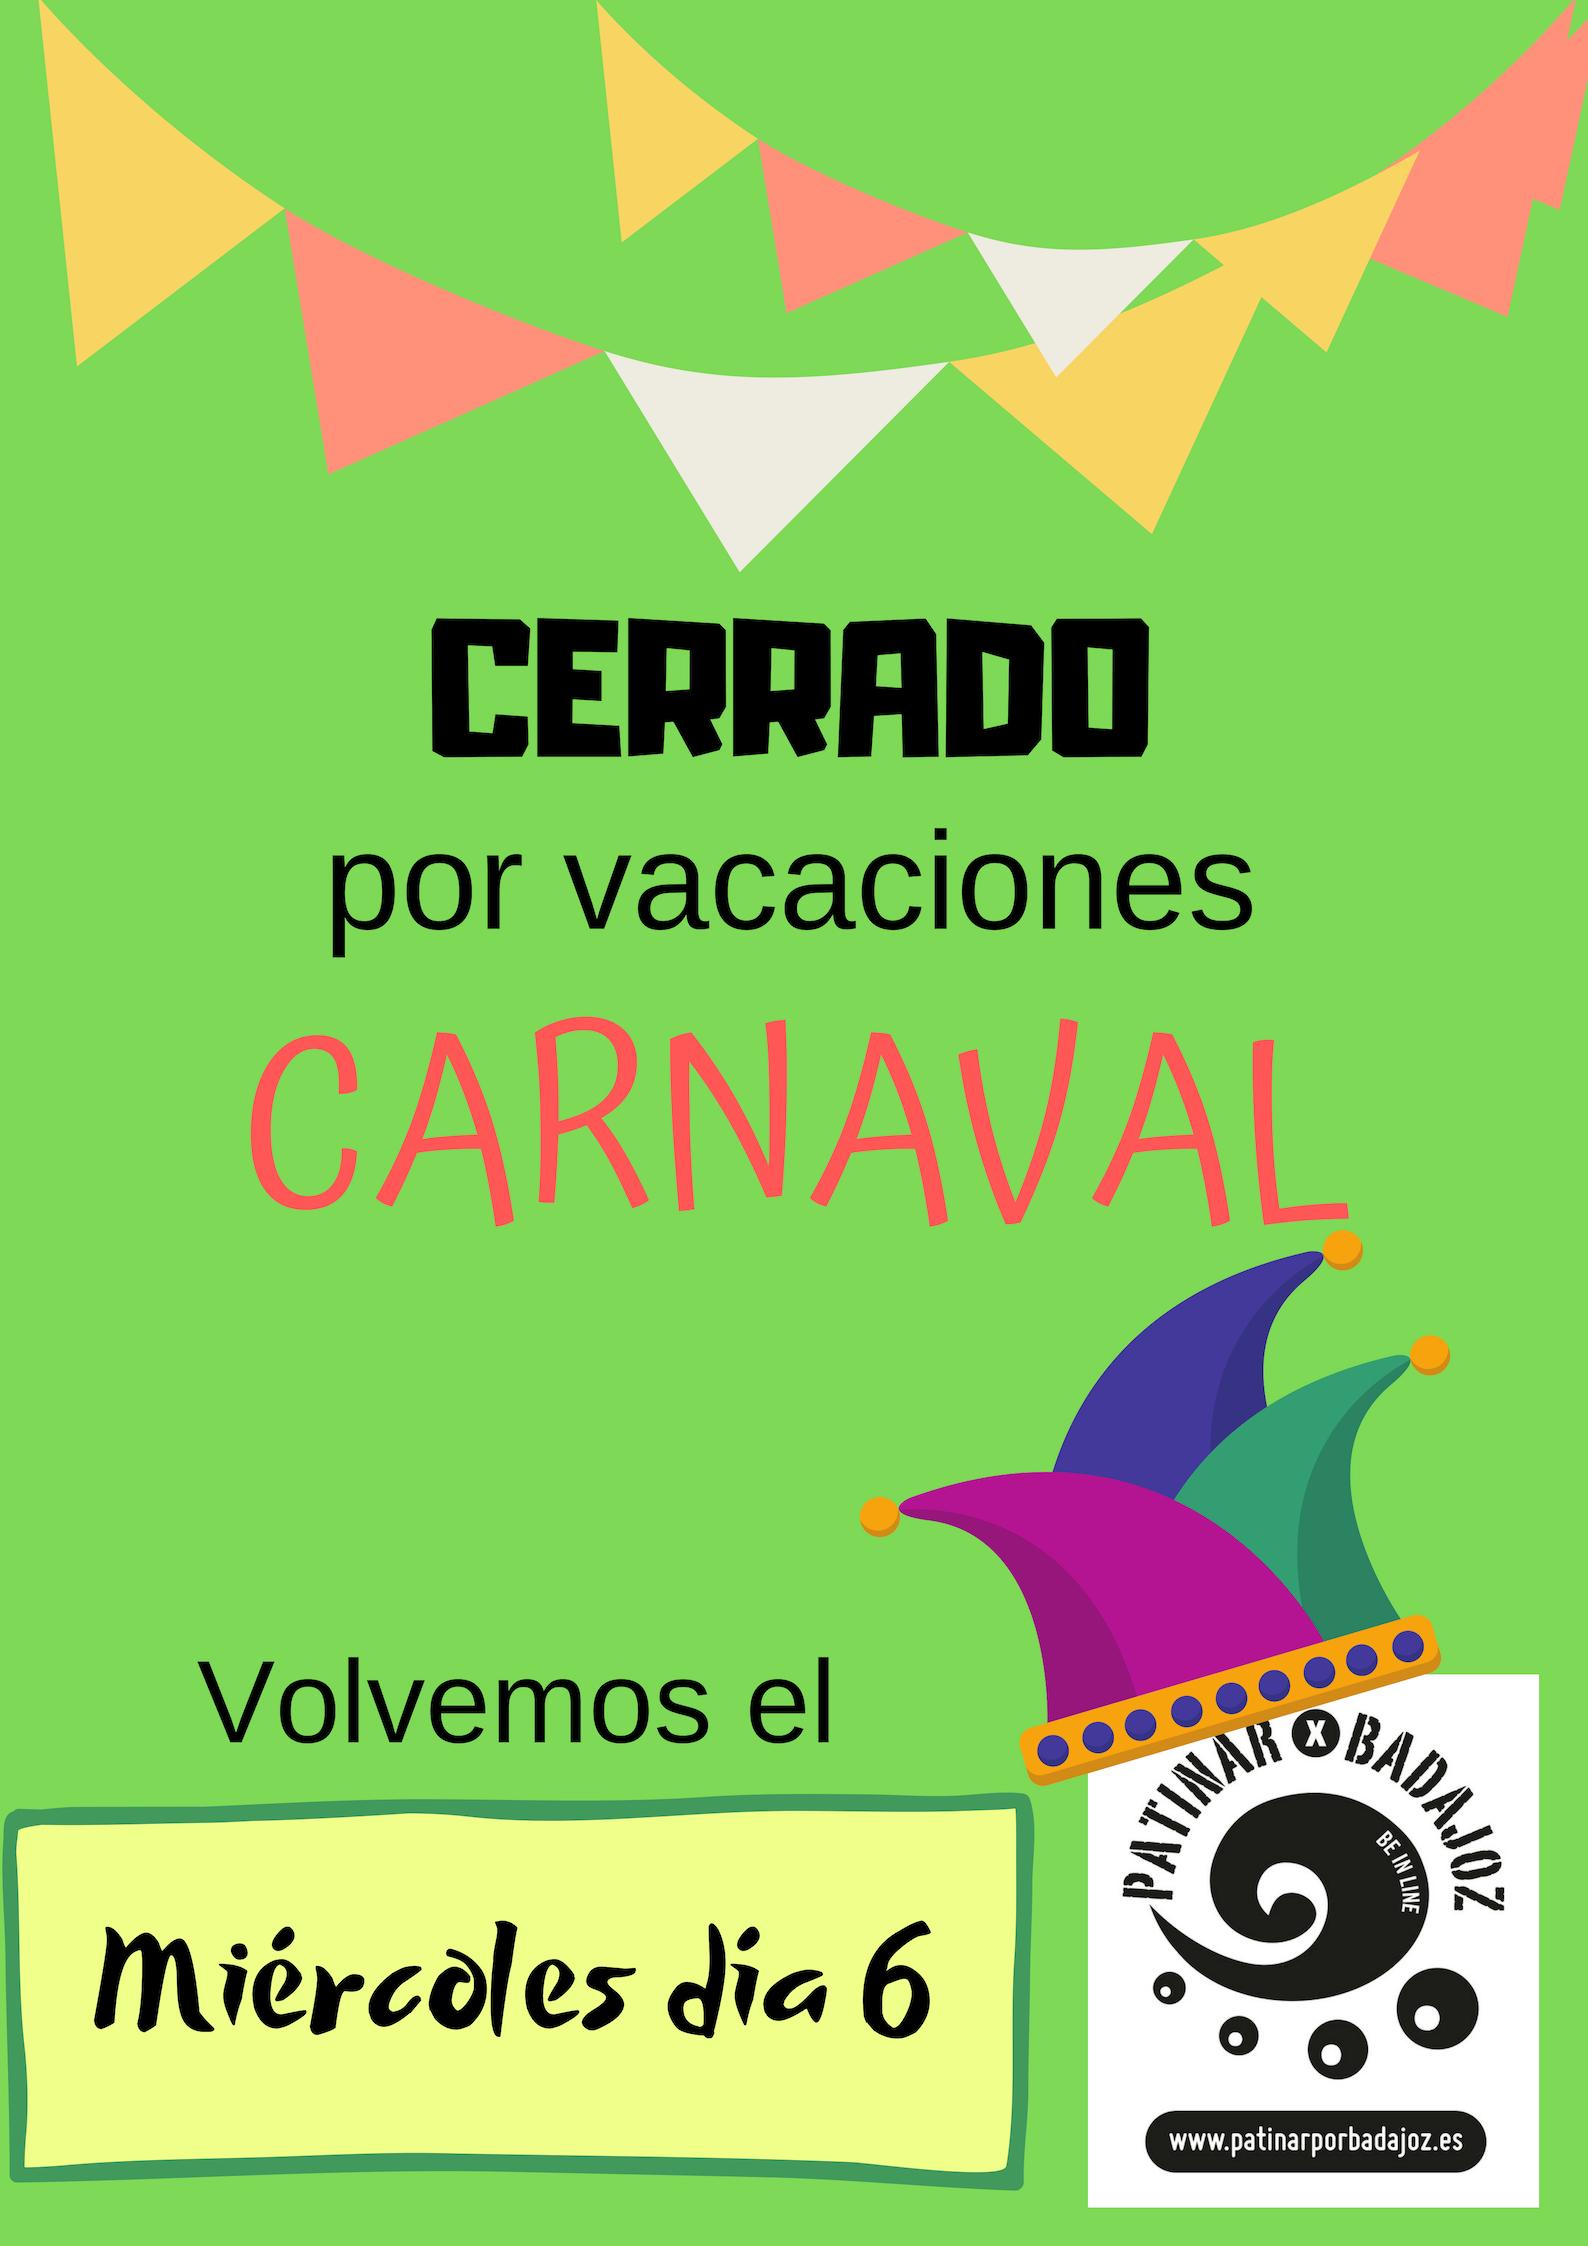 CERRADO carnaval 19